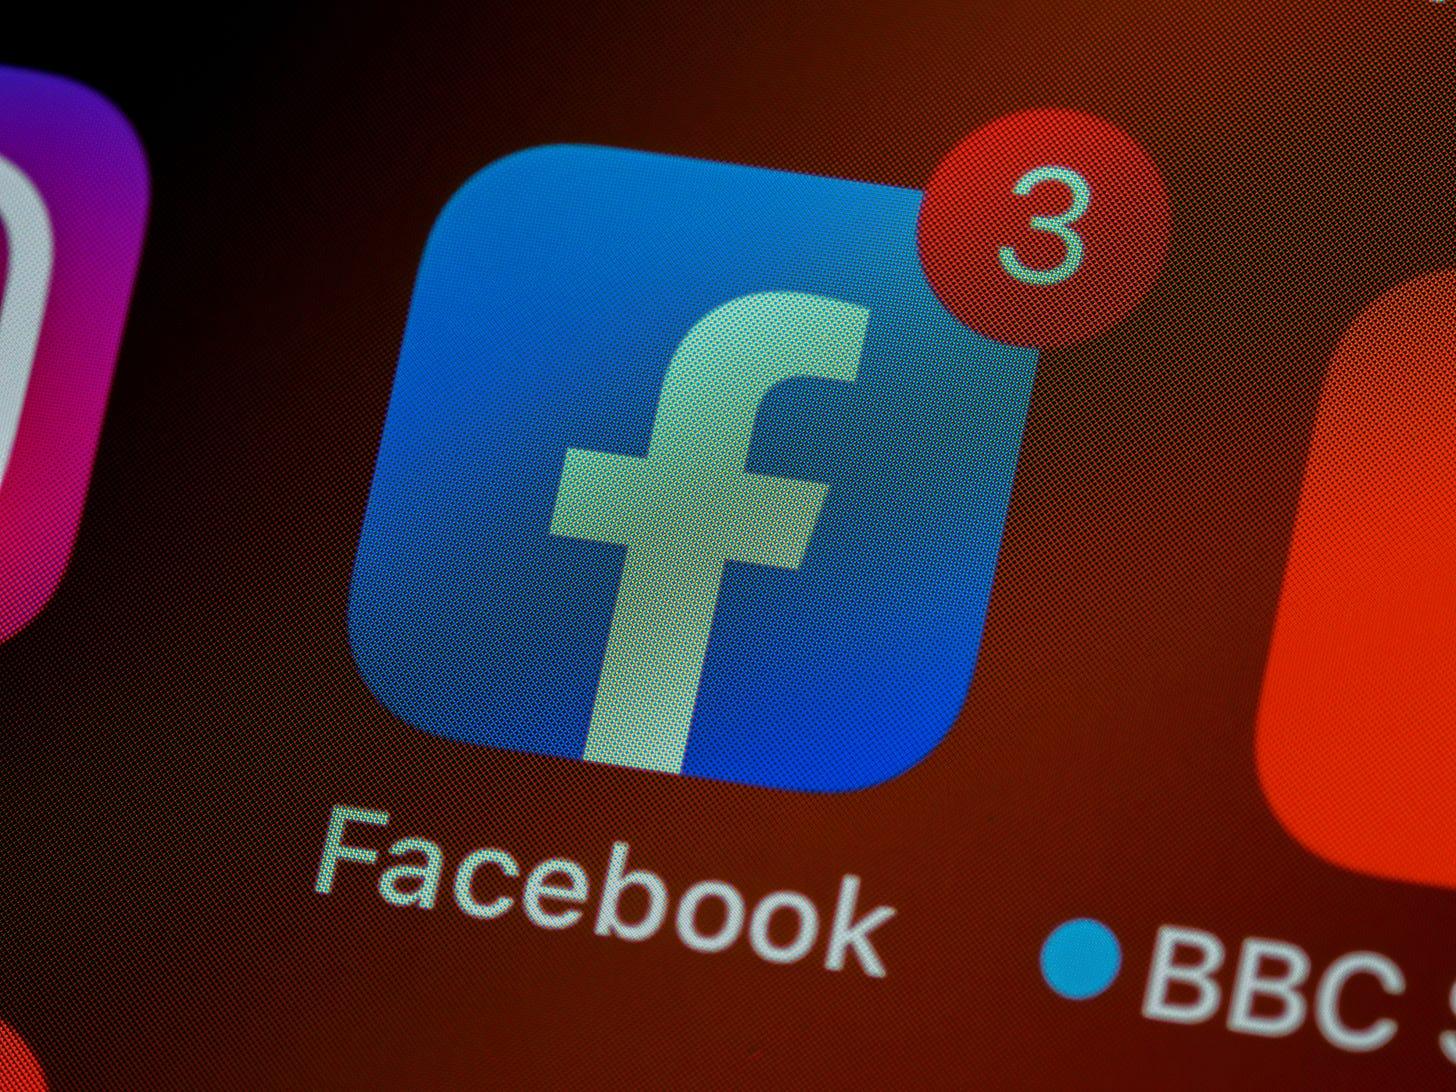 Photo of Facebook app icon on an iPhone. Brett Jordan / Unsplash